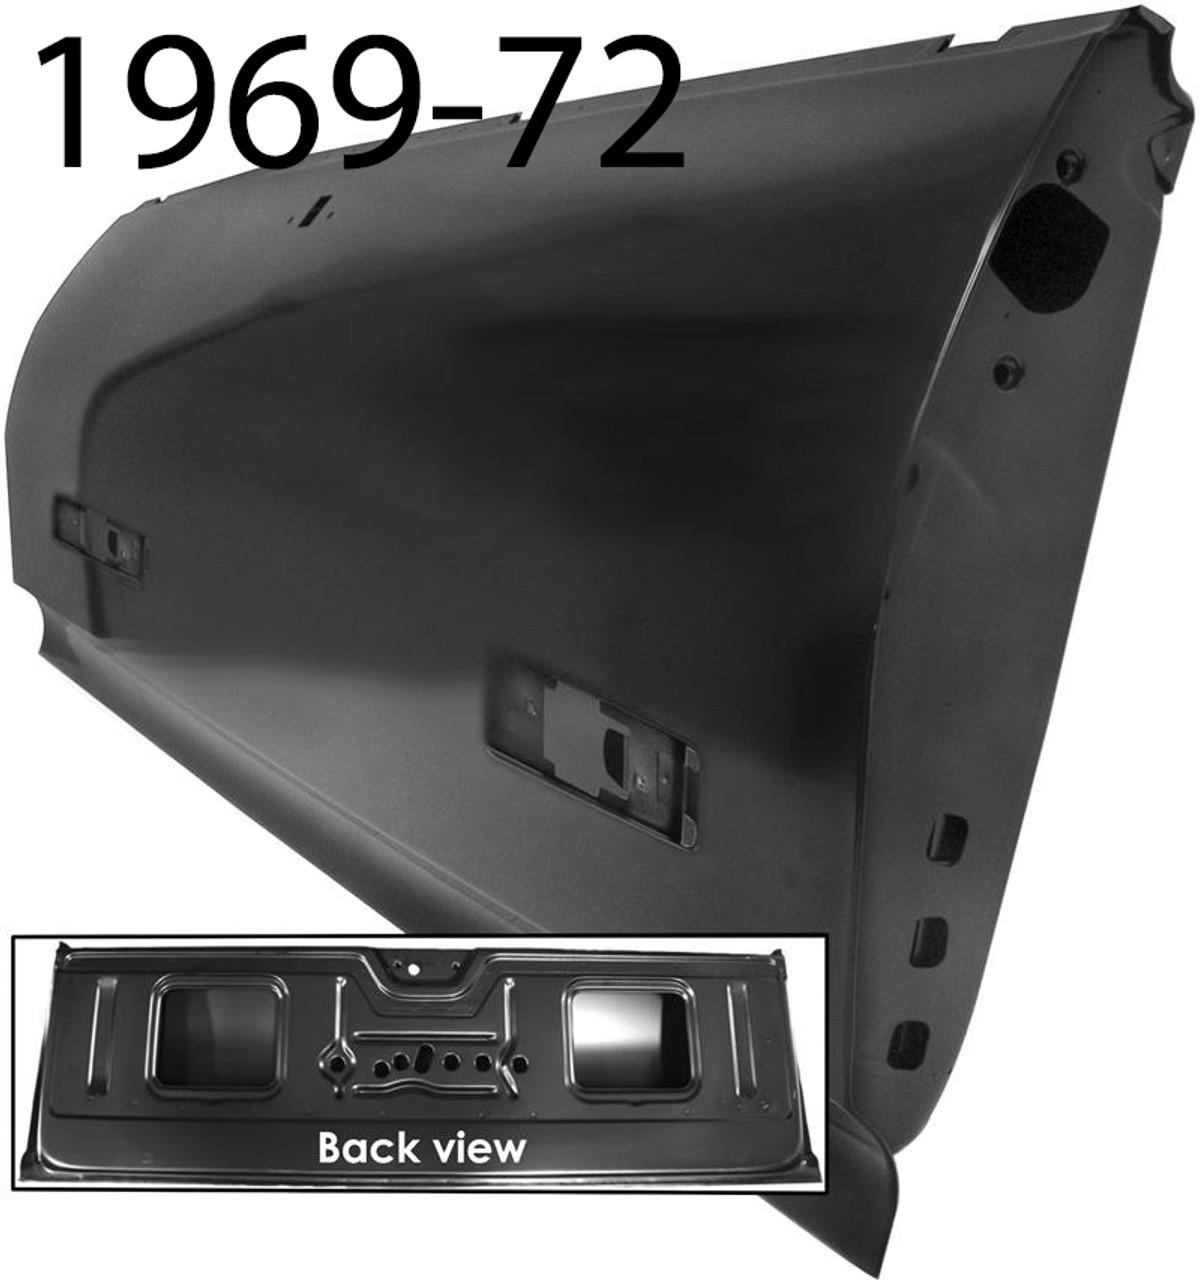 1968-72 El Camino Tailgate Panel (ea)